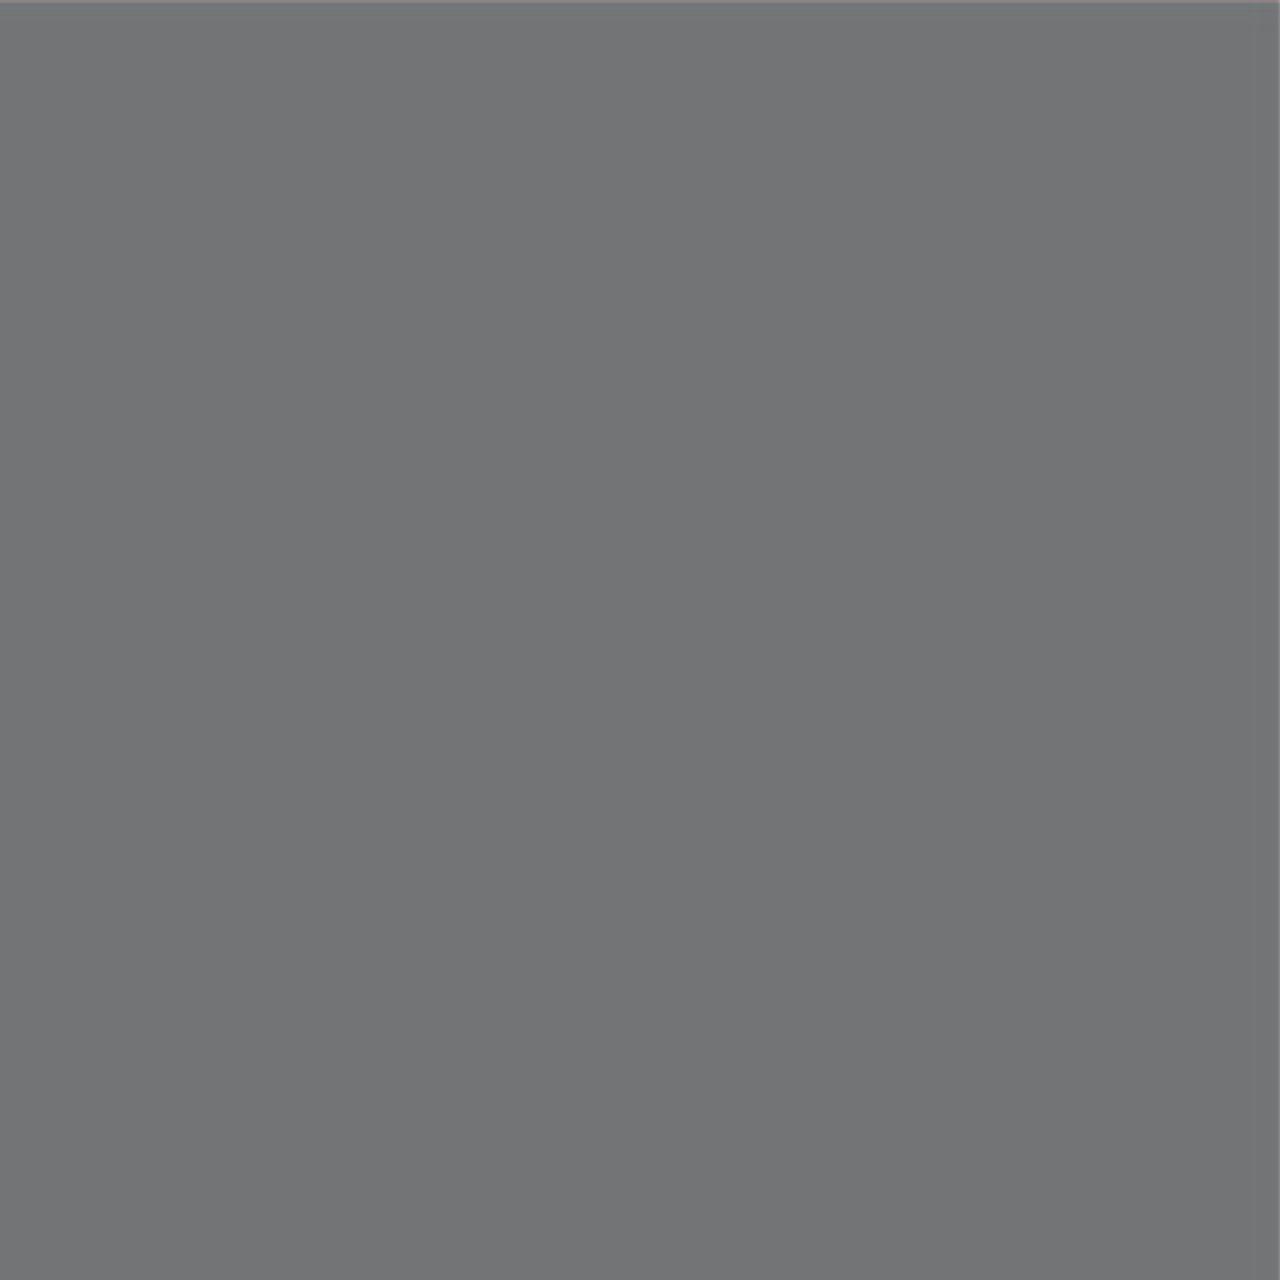 Fundermax, Standardfarbe, Dunkelgrau